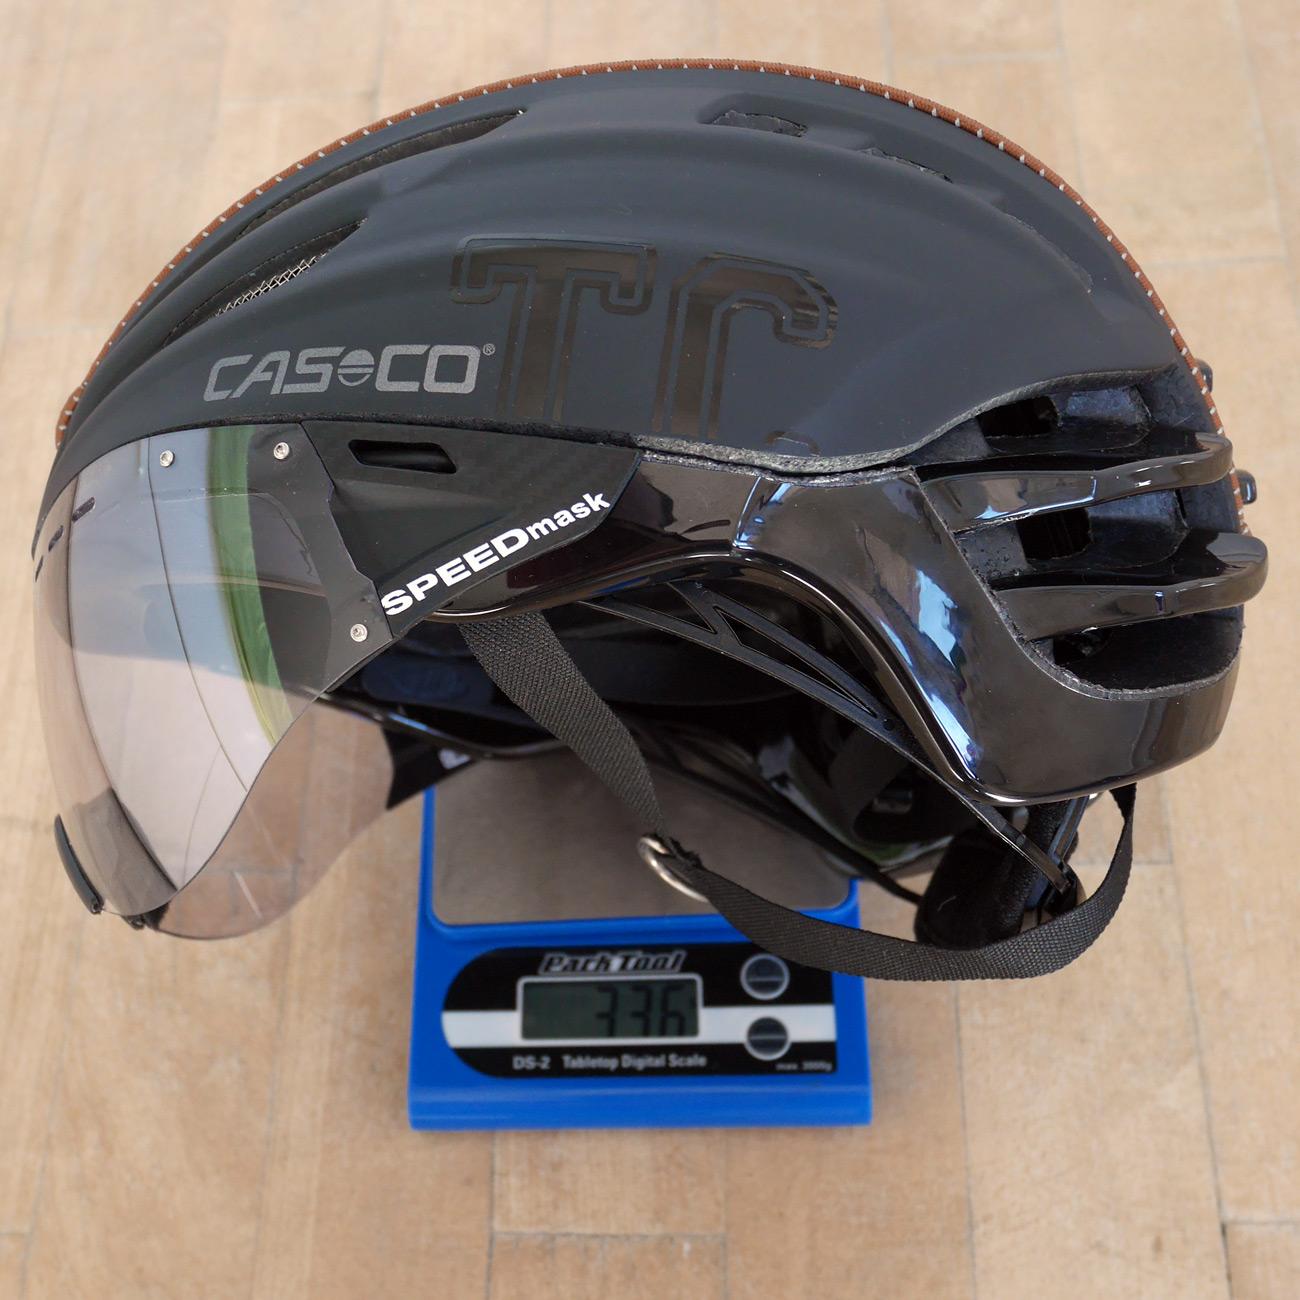 Casco_Speed-Airo-TCS-aero-road-helmet_actual-weight-336g_size-M